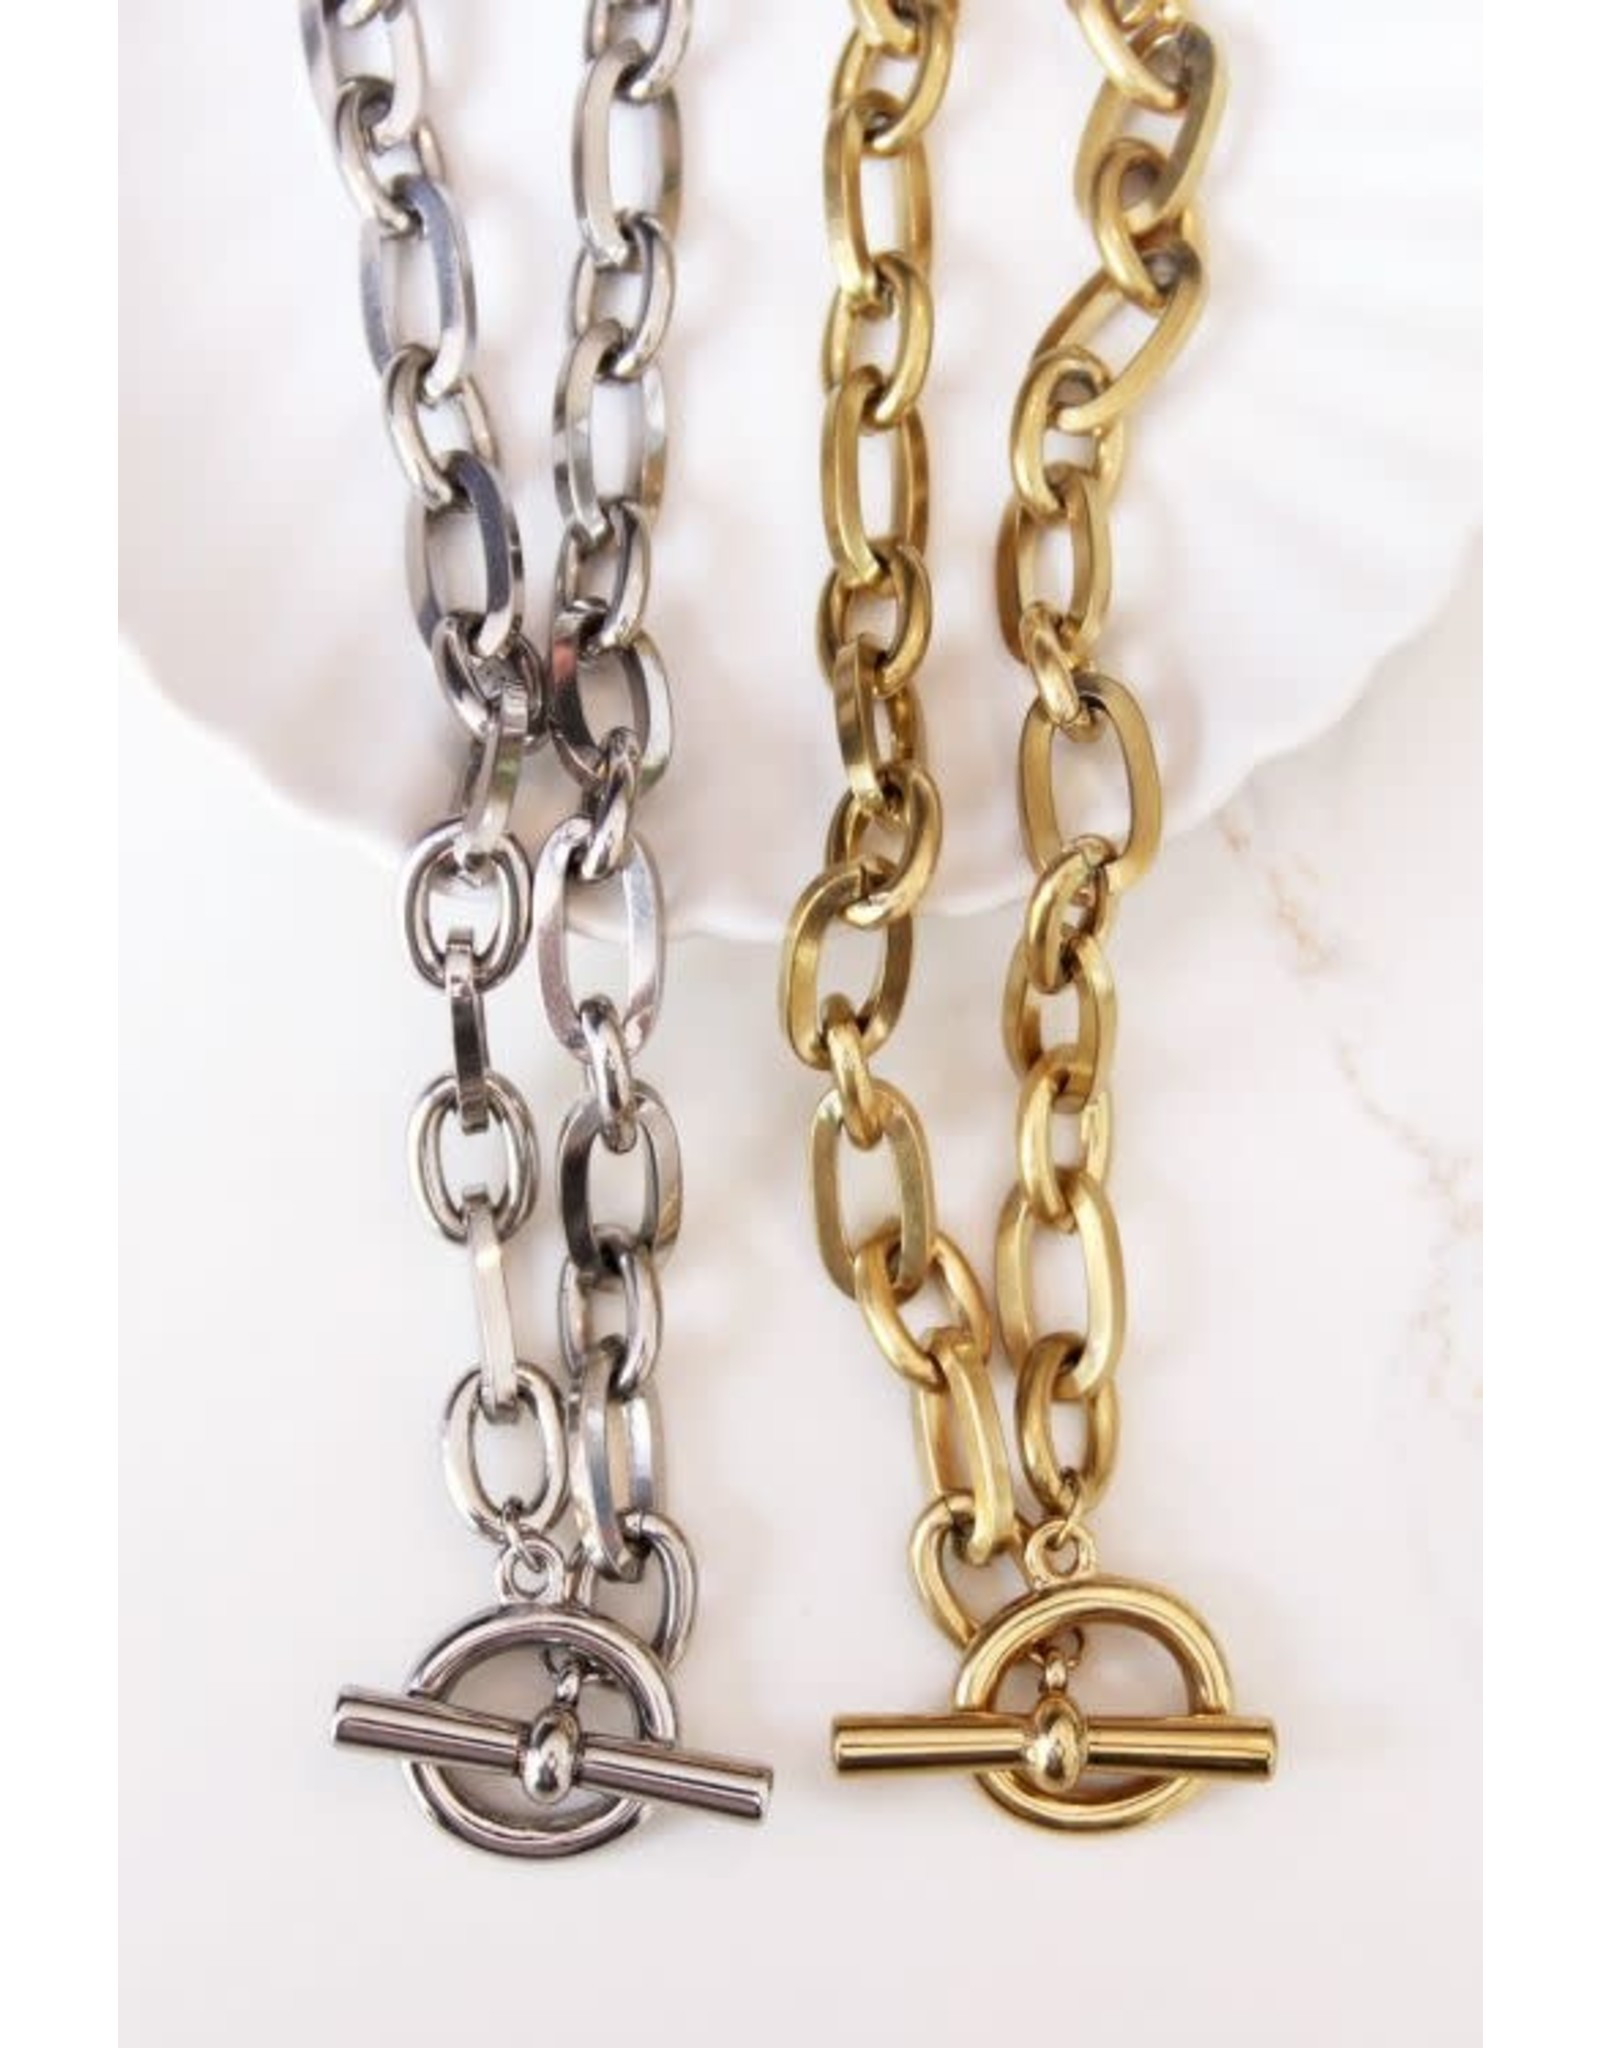 My Jewellery My Jewellery schakelketting kapittelslot